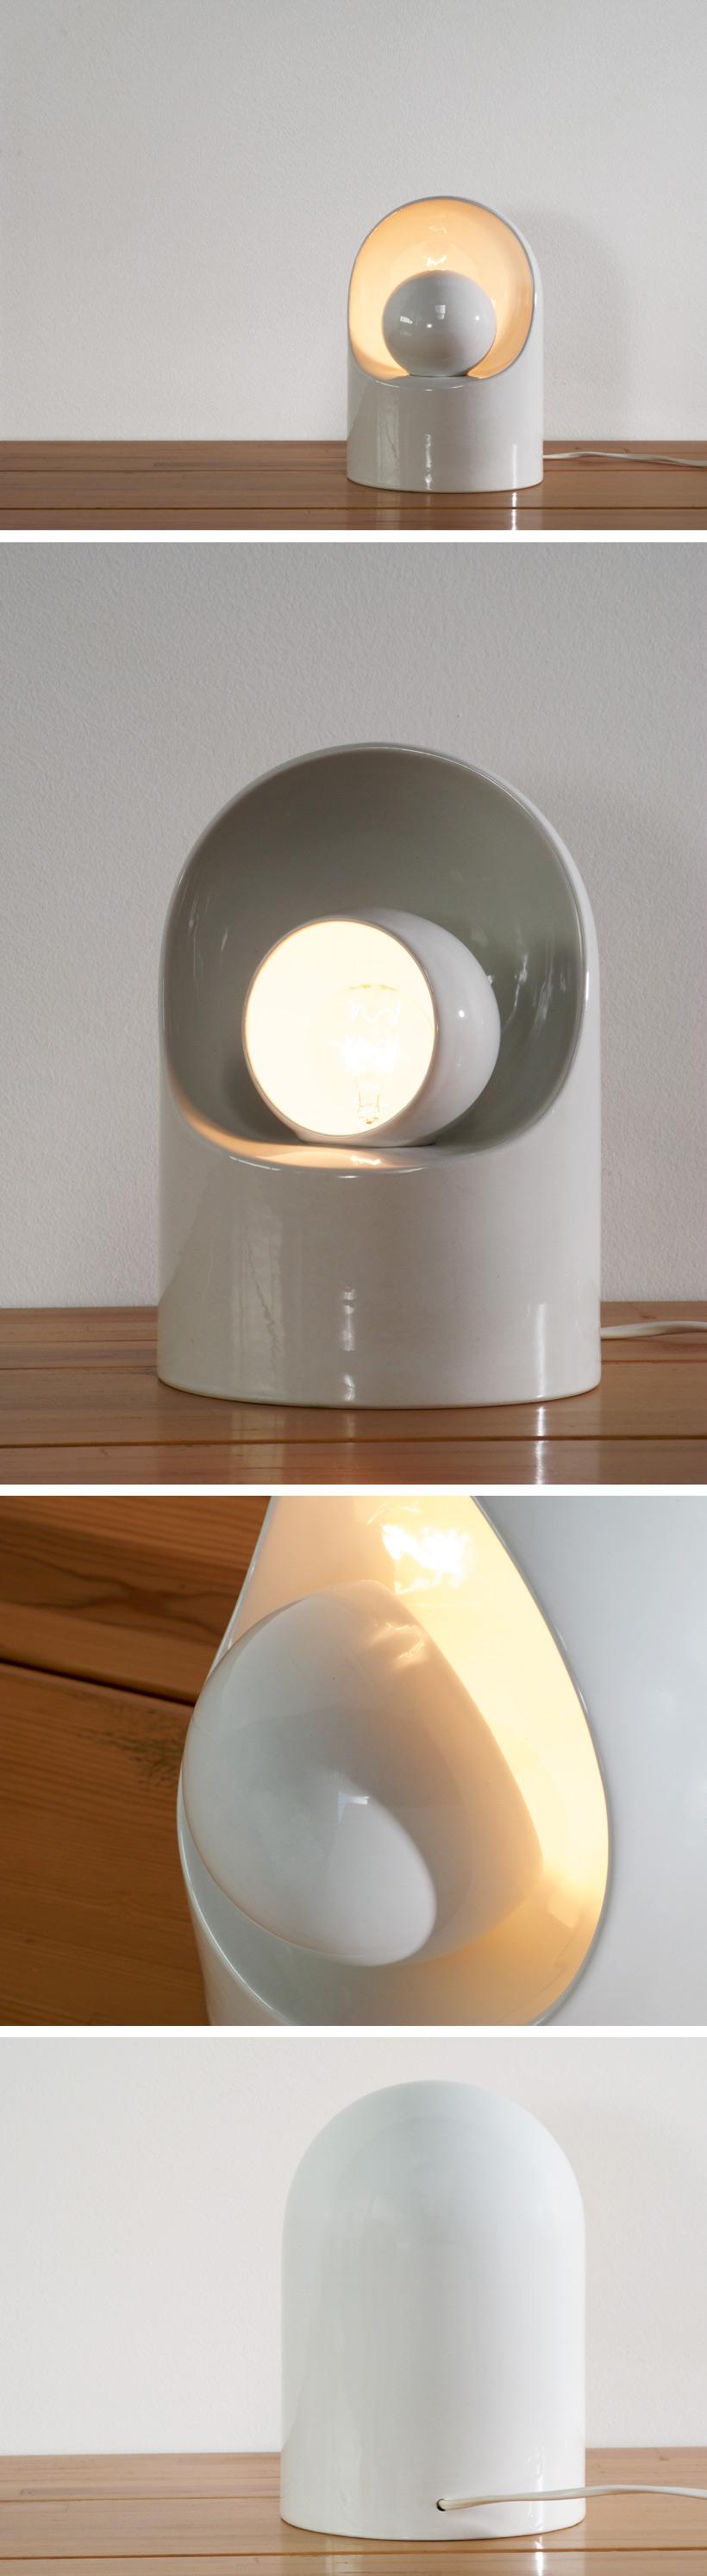 Ceramic lamp Marcello Cuneo for Gabianelli Large